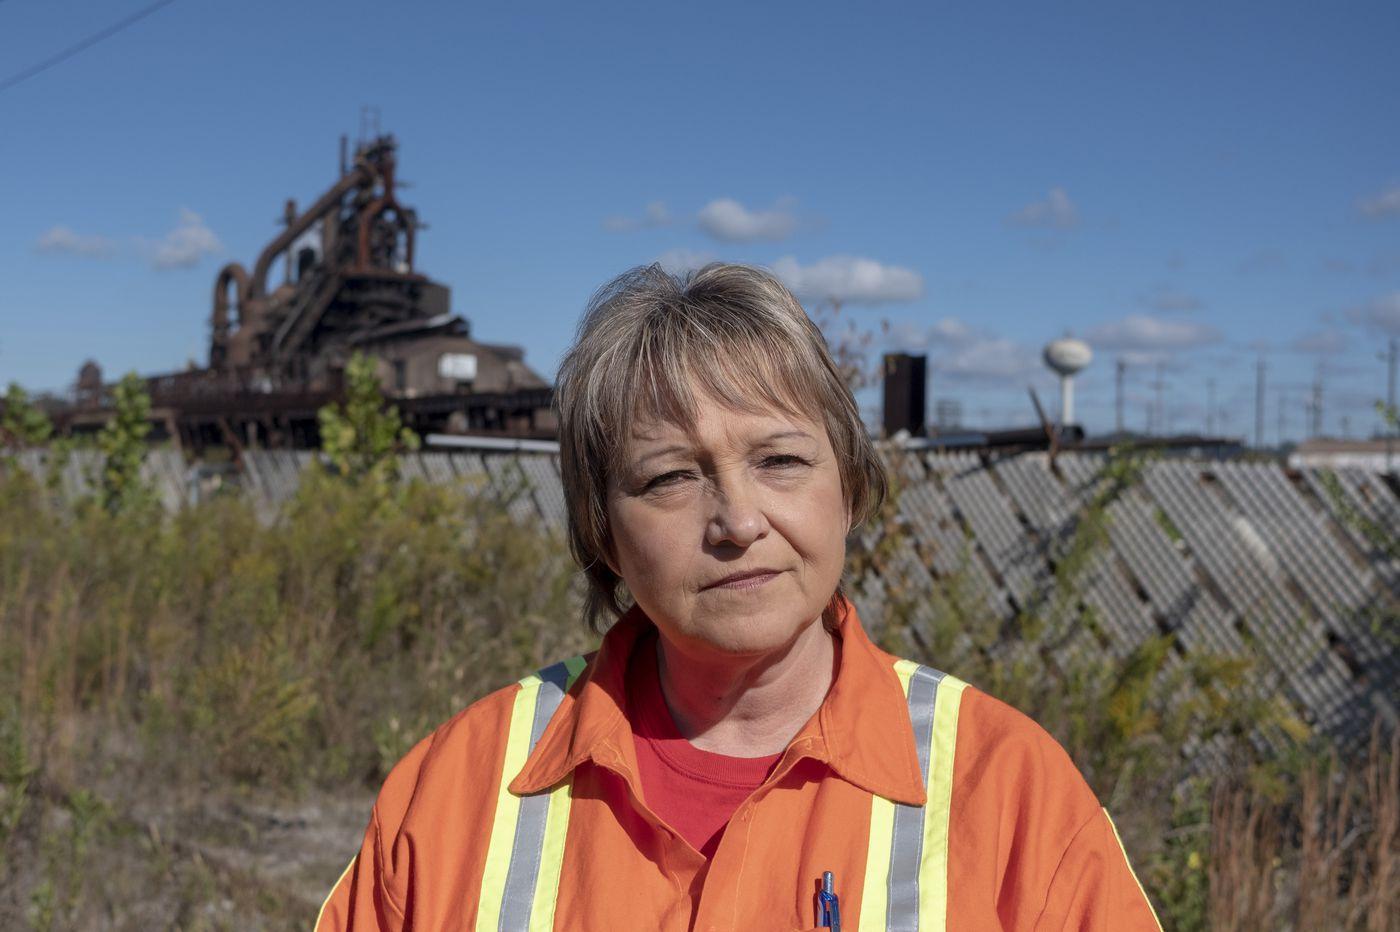 As a Kentucky steel mill shutters, tariffs come into question